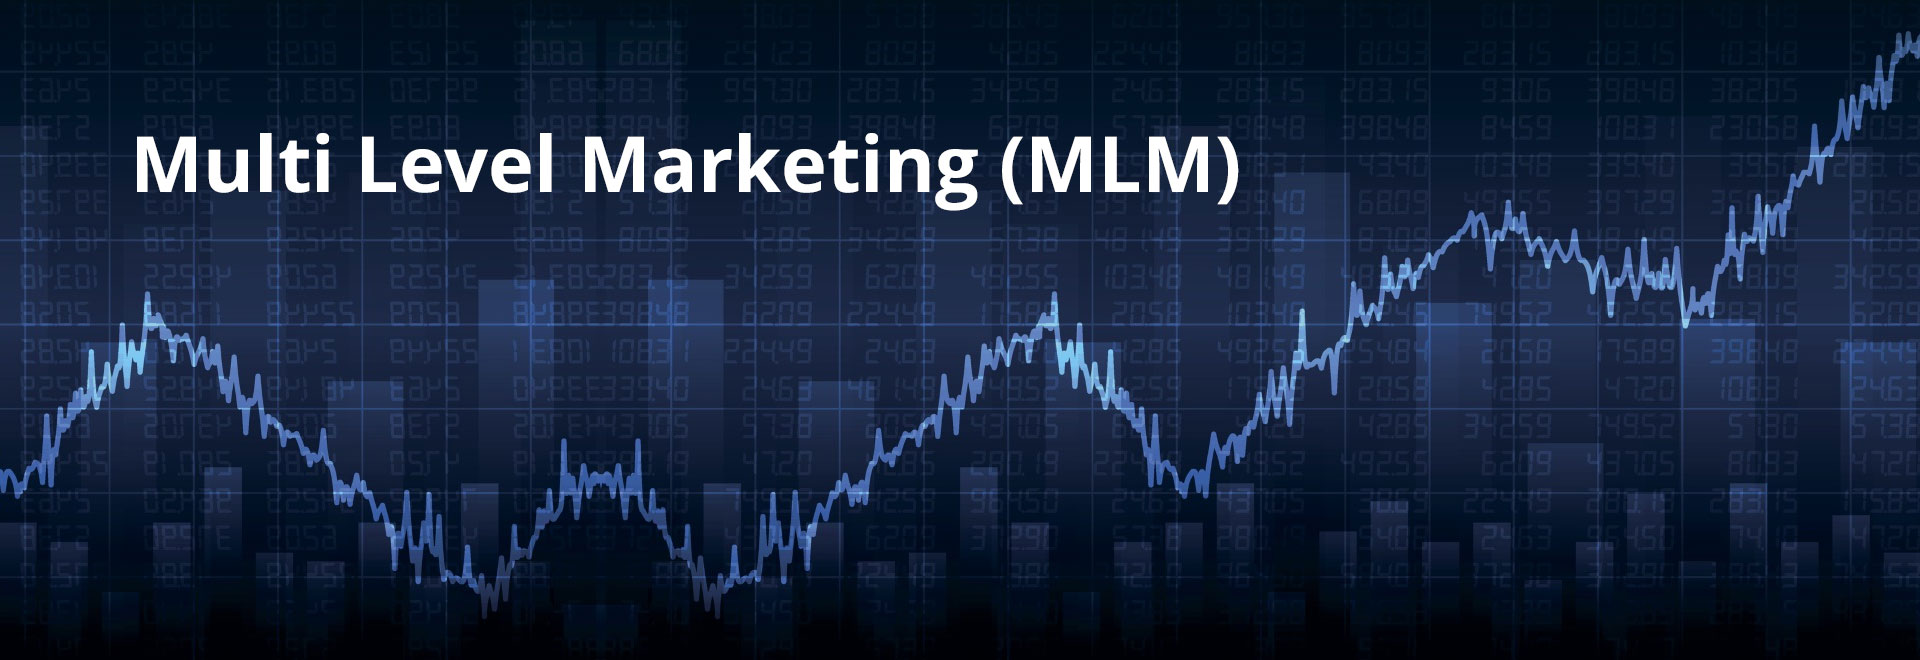 Multi Level Marketing (MLM)